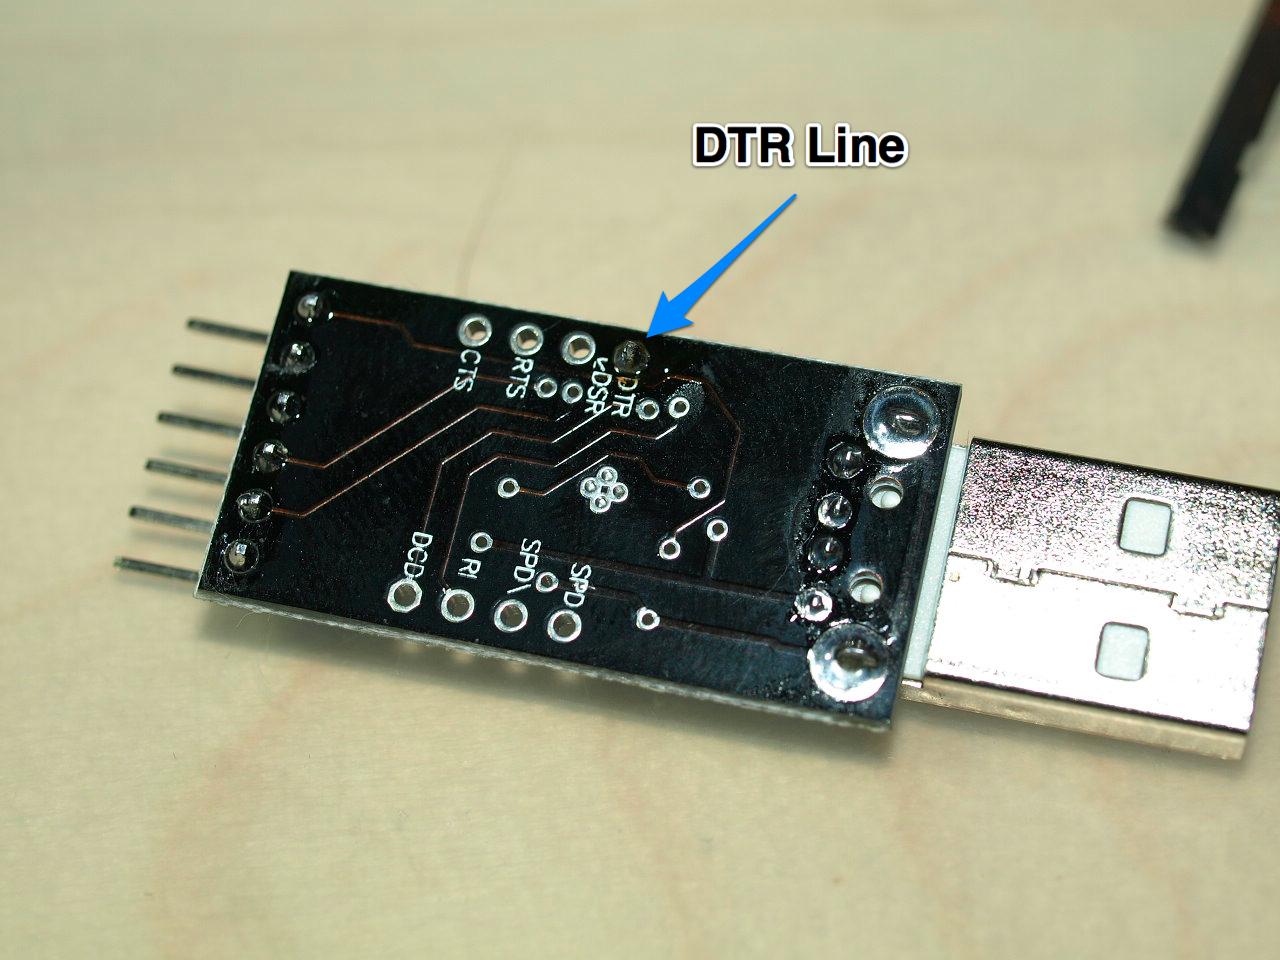 Модифицирование преобразователя USB-UART на чипе CP2102 для